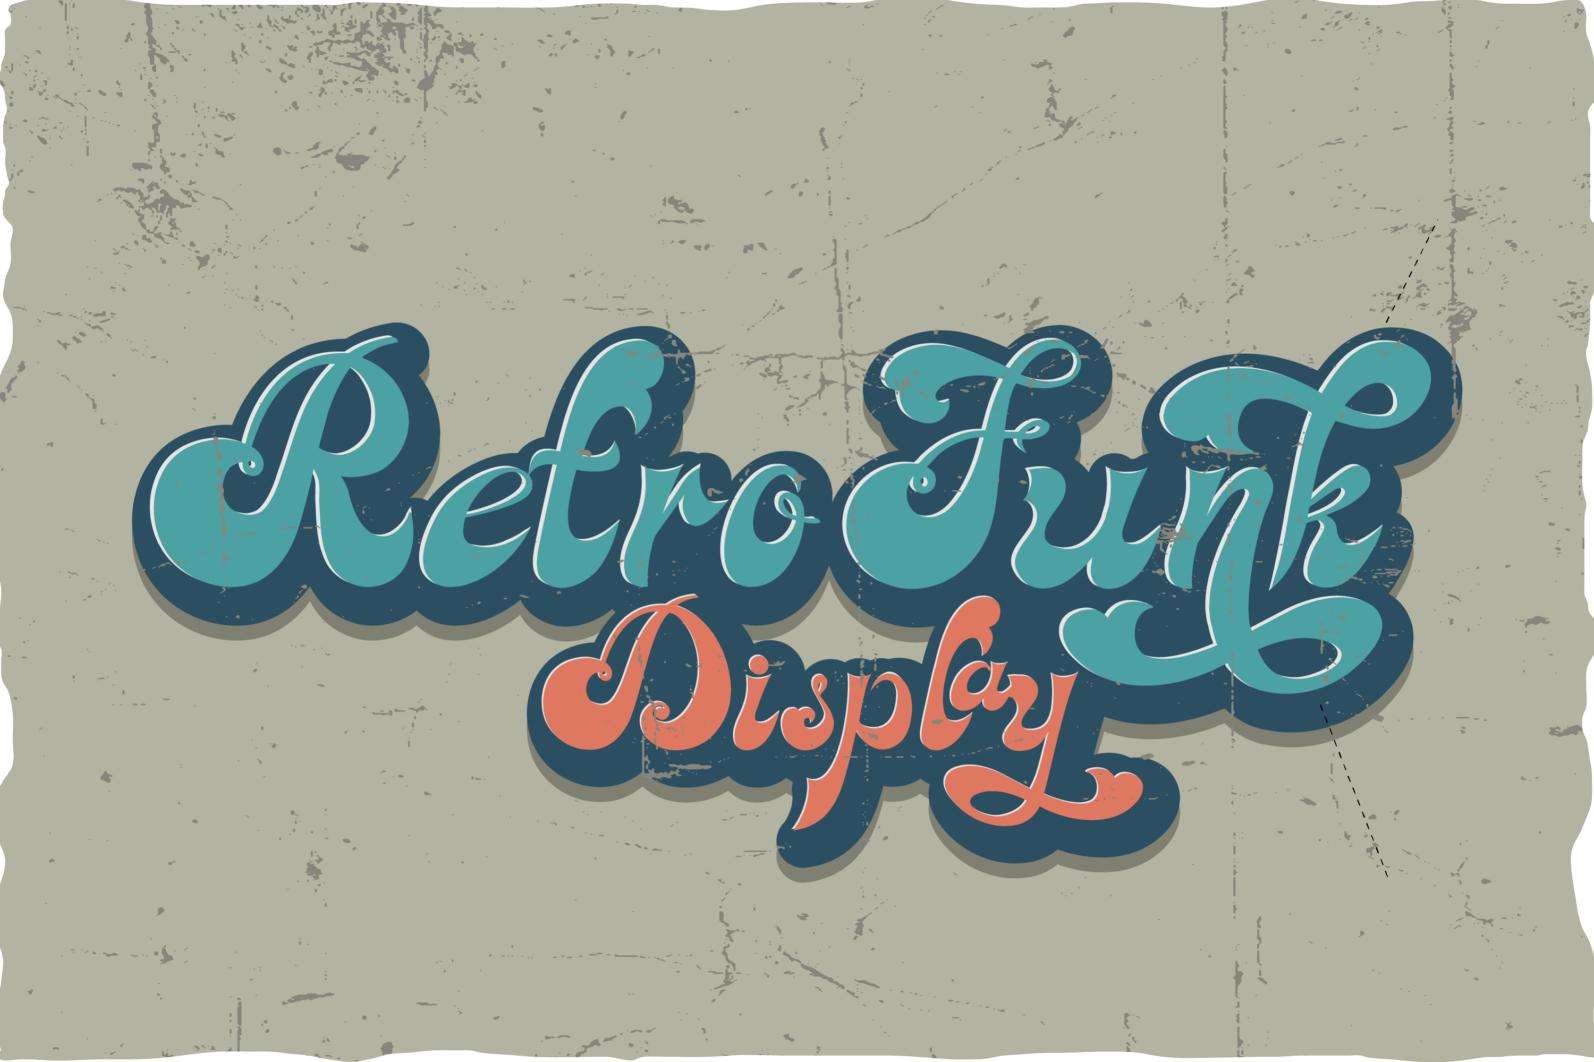 Achandria a Vintage Retro Font - 06 -